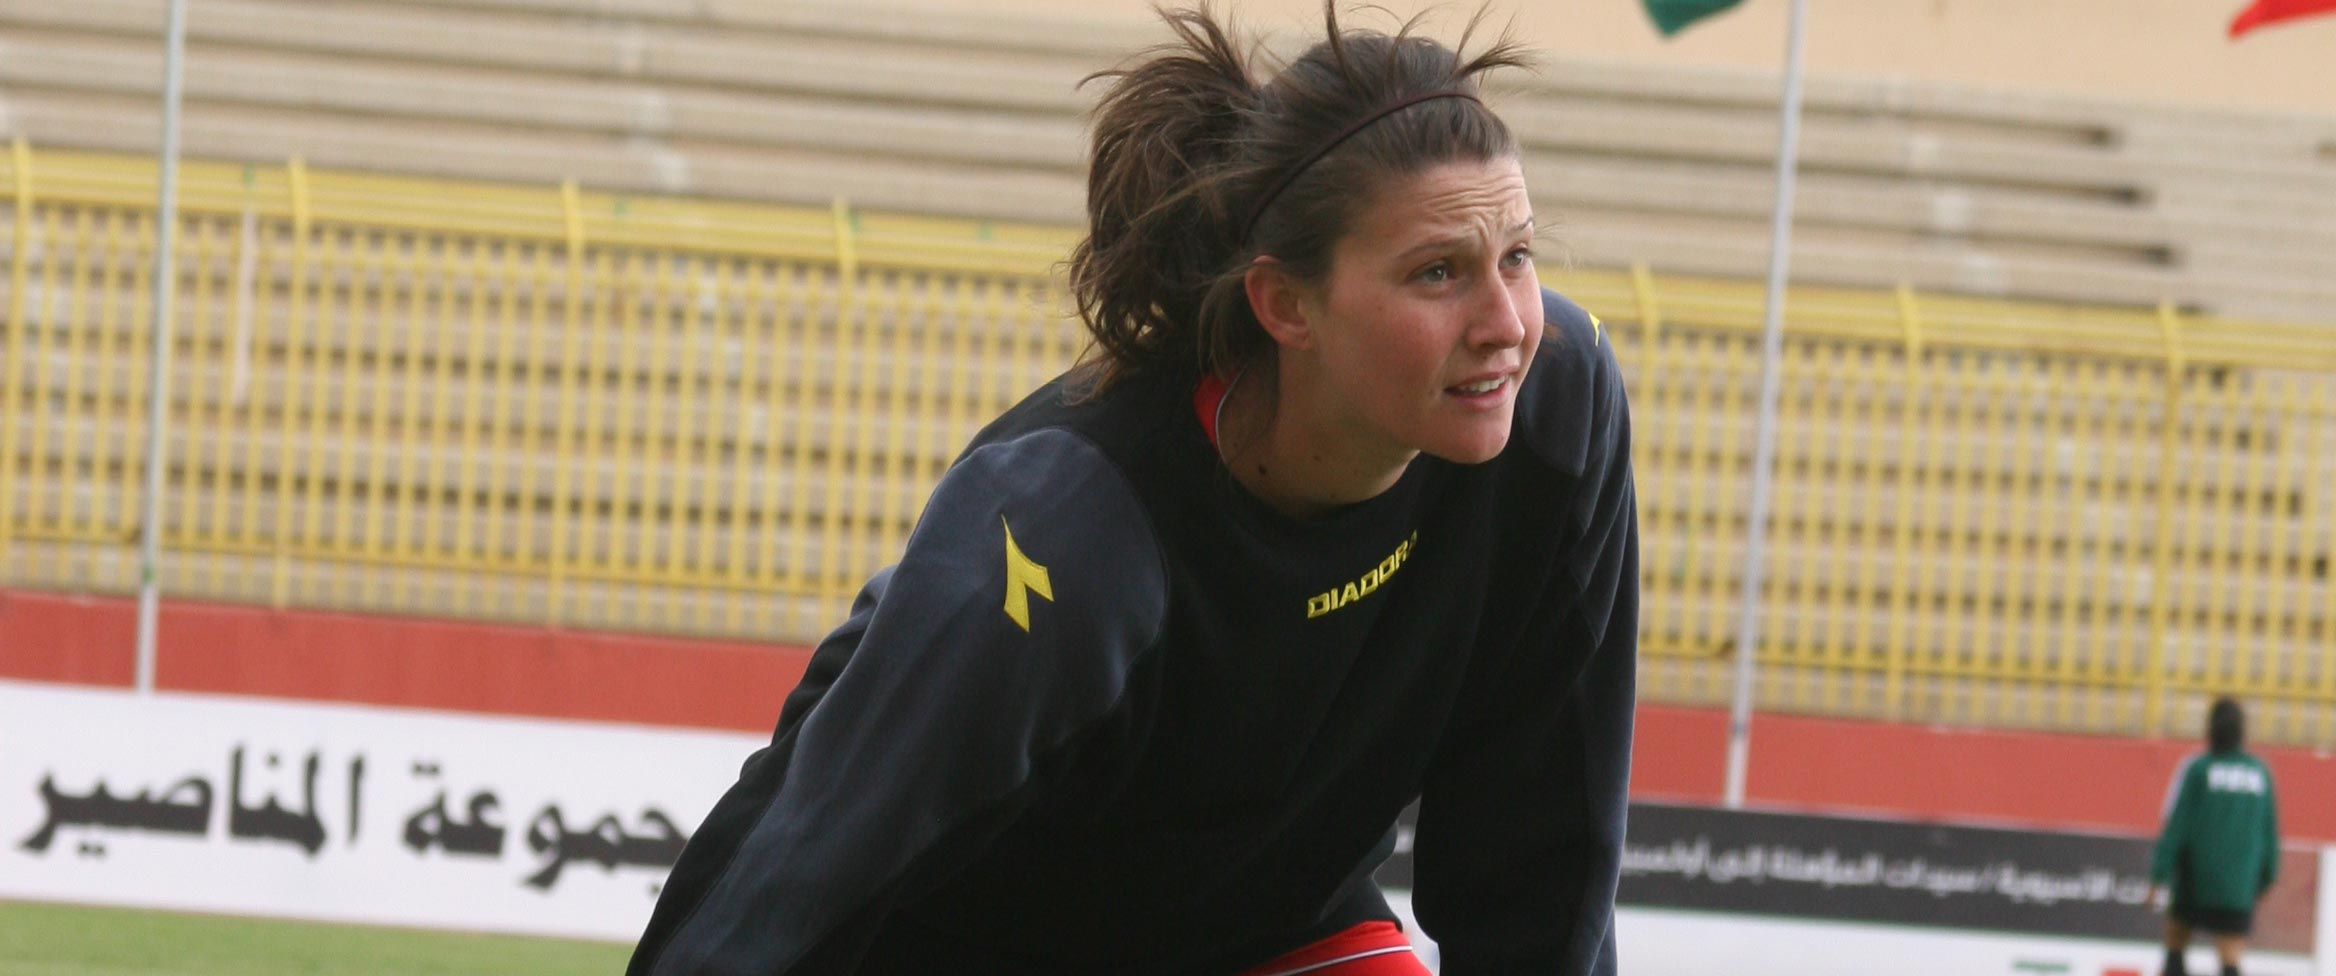 Women in the Stadium